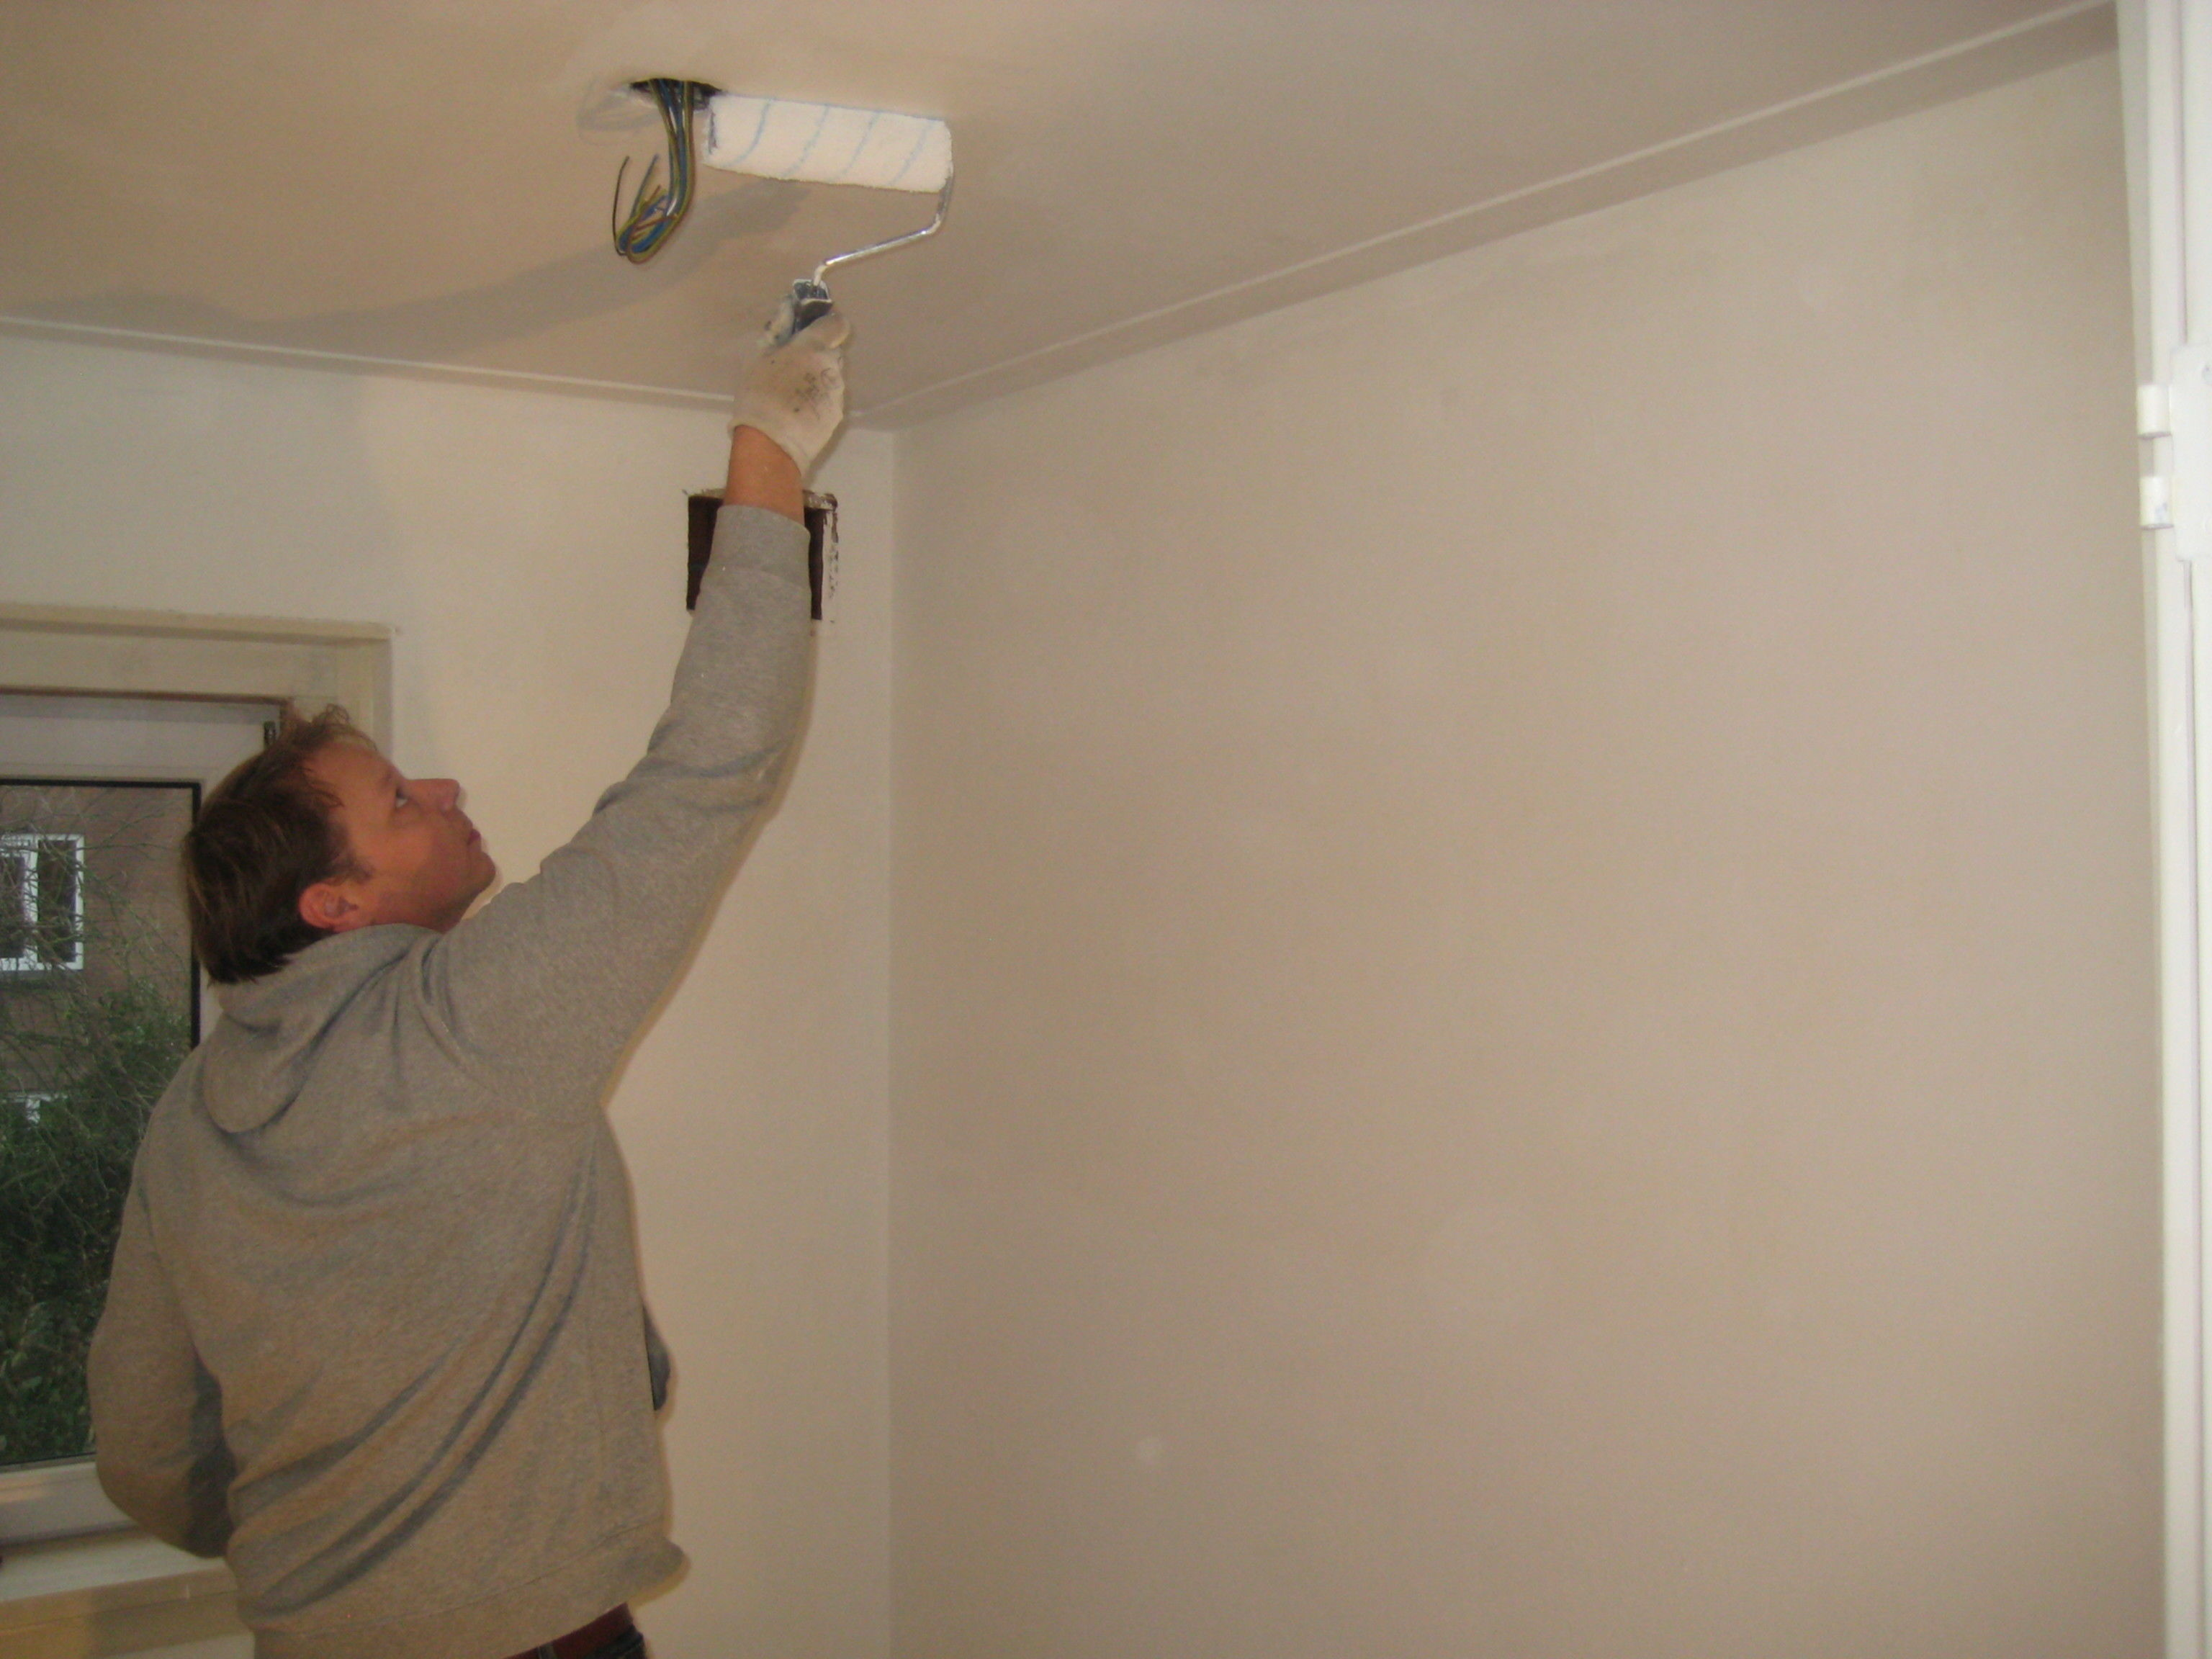 Badkamer Plafond Witten : Hoe kan je het beste je plafond witten voordemakers